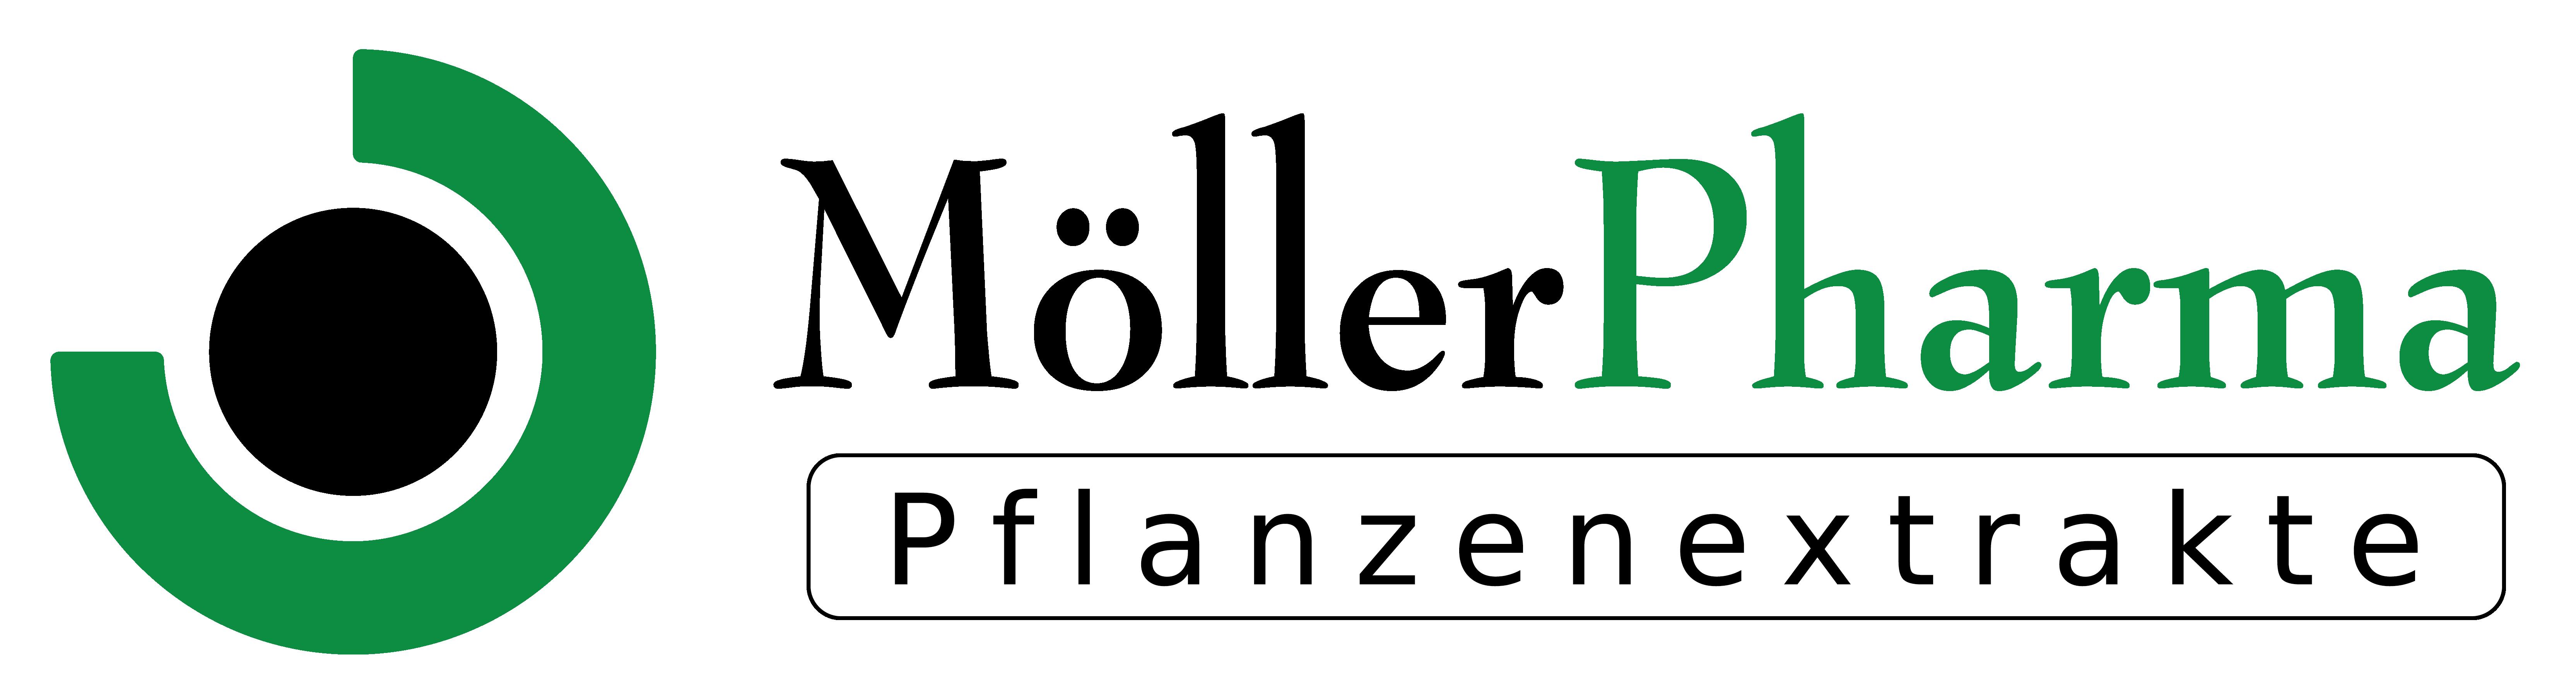 Möller Pharma Pflanzenextrakte